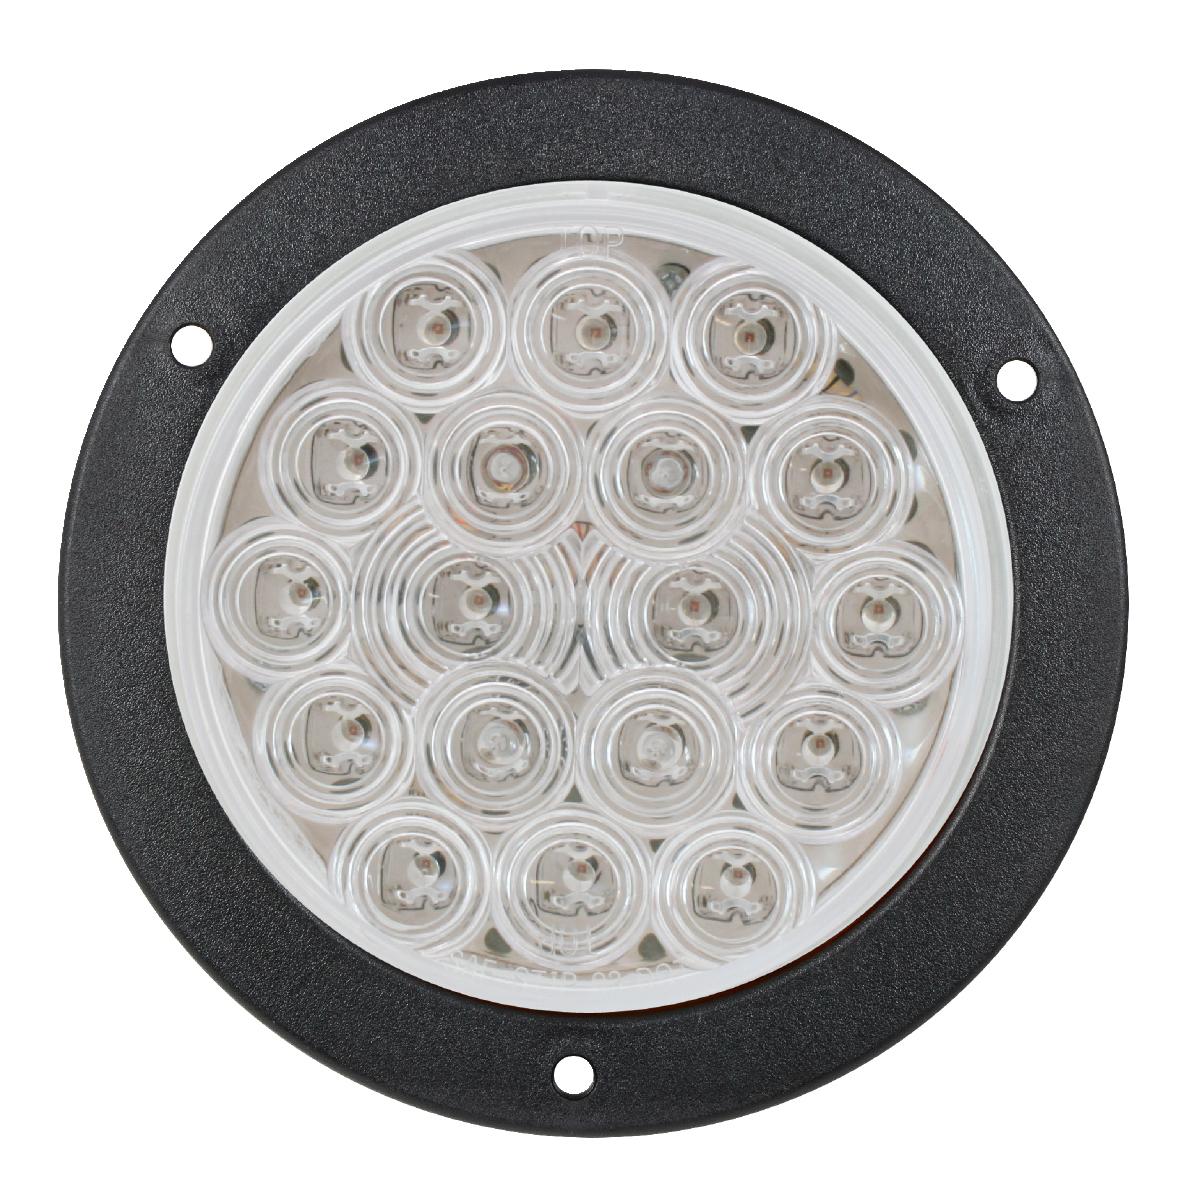 "4"" Fleet LED Light with Black Flange Mount in Clear Lens"